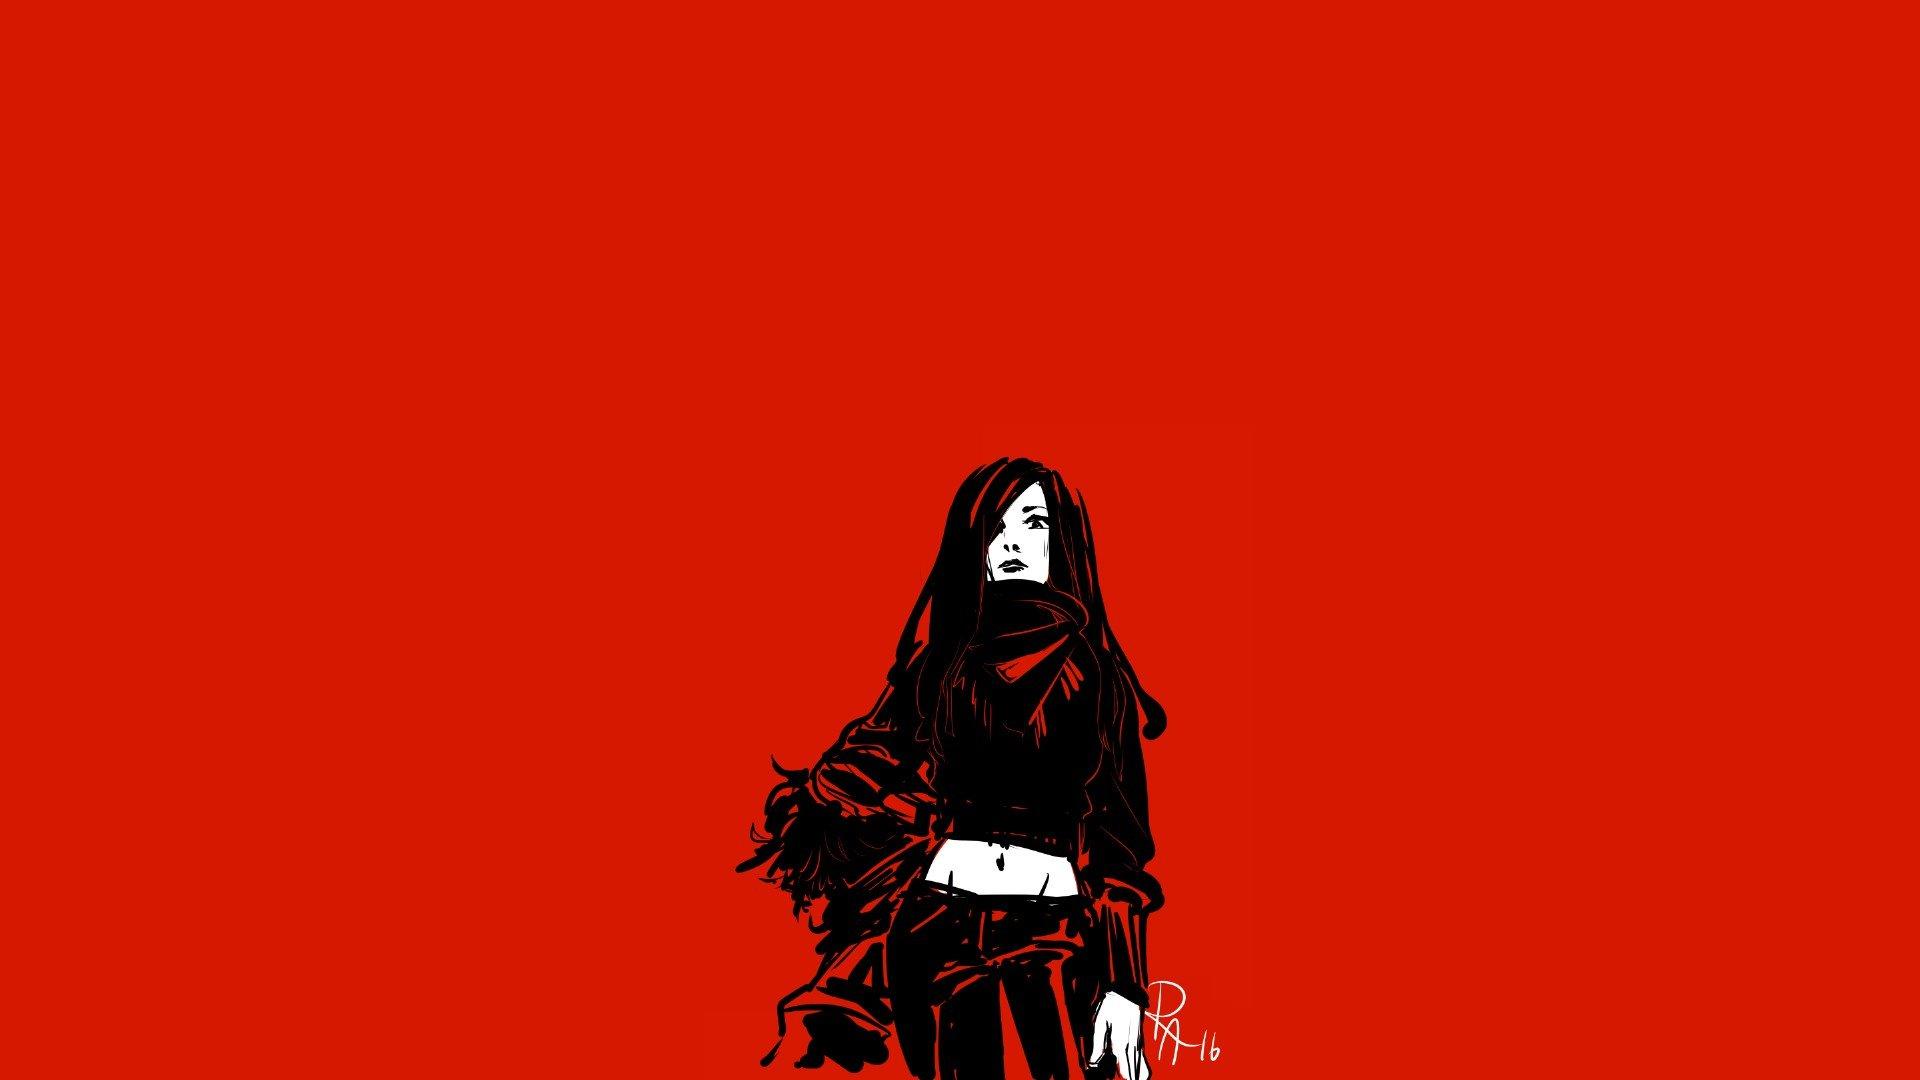 Wallpaper 1920x1080 Px Black Hair Coats Minimalism Red